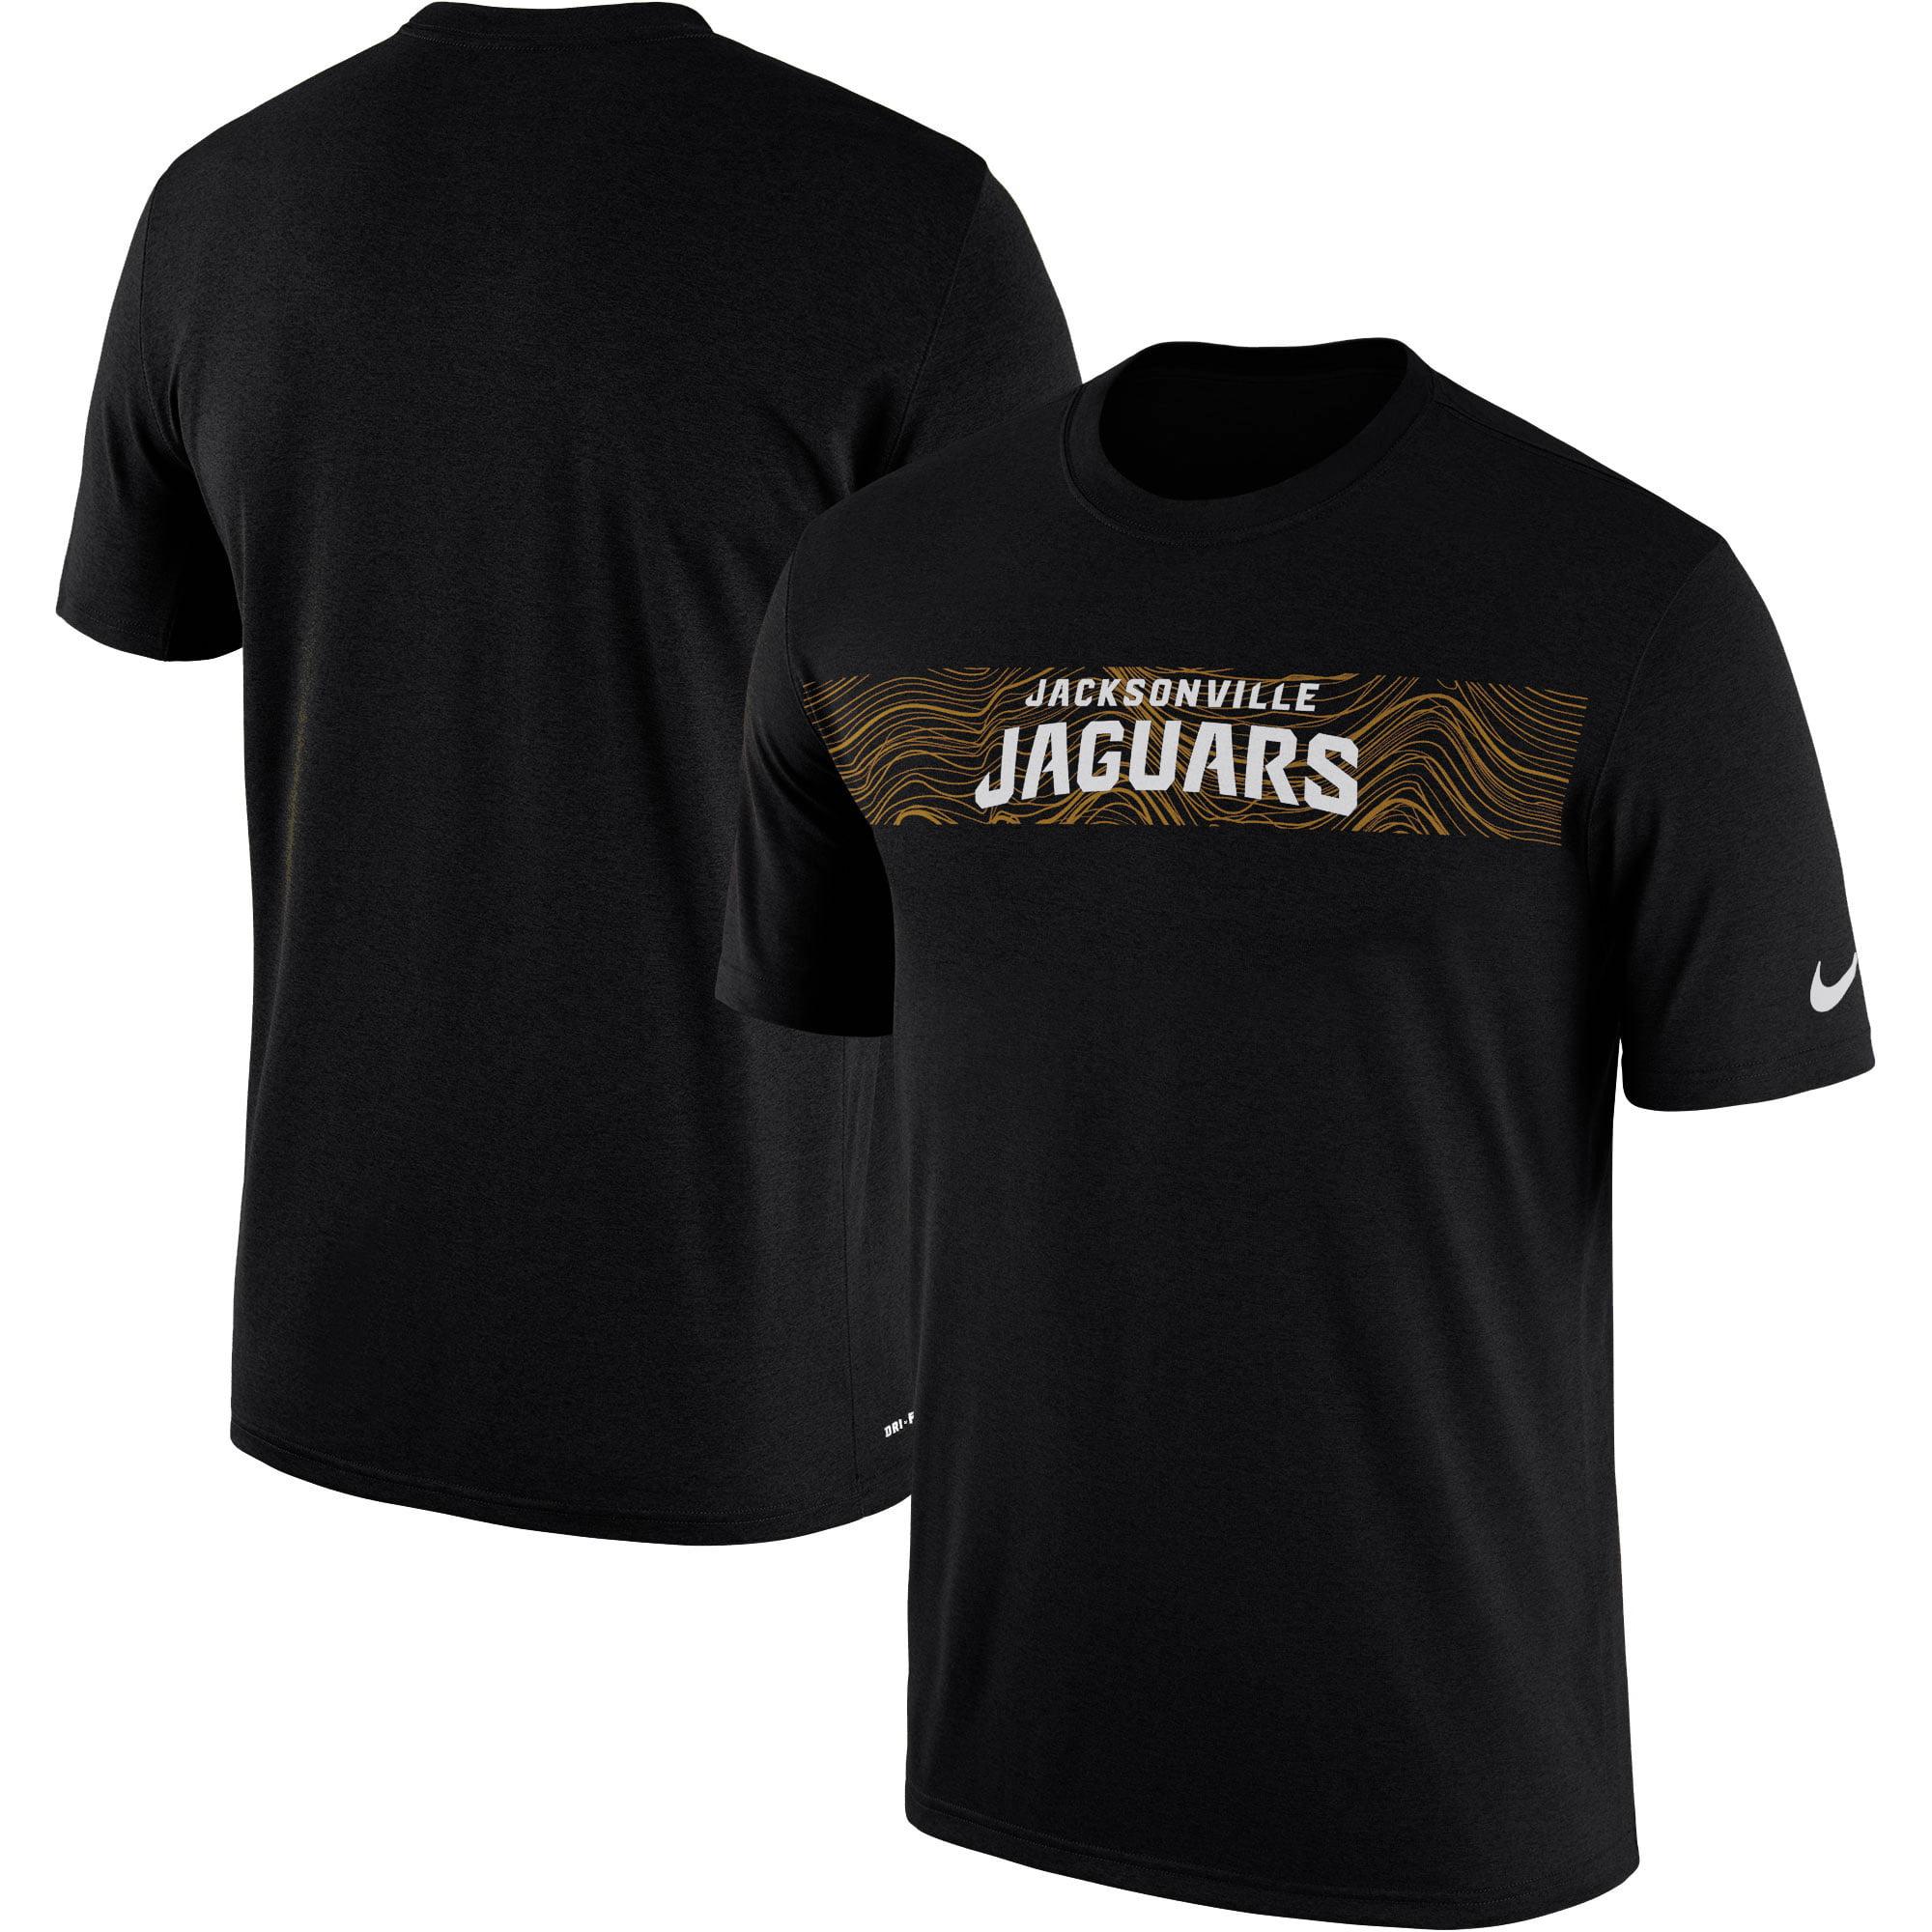 Jacksonville Jaguars Nike Sideline Seismic Legend Performance T-Shirt - Black